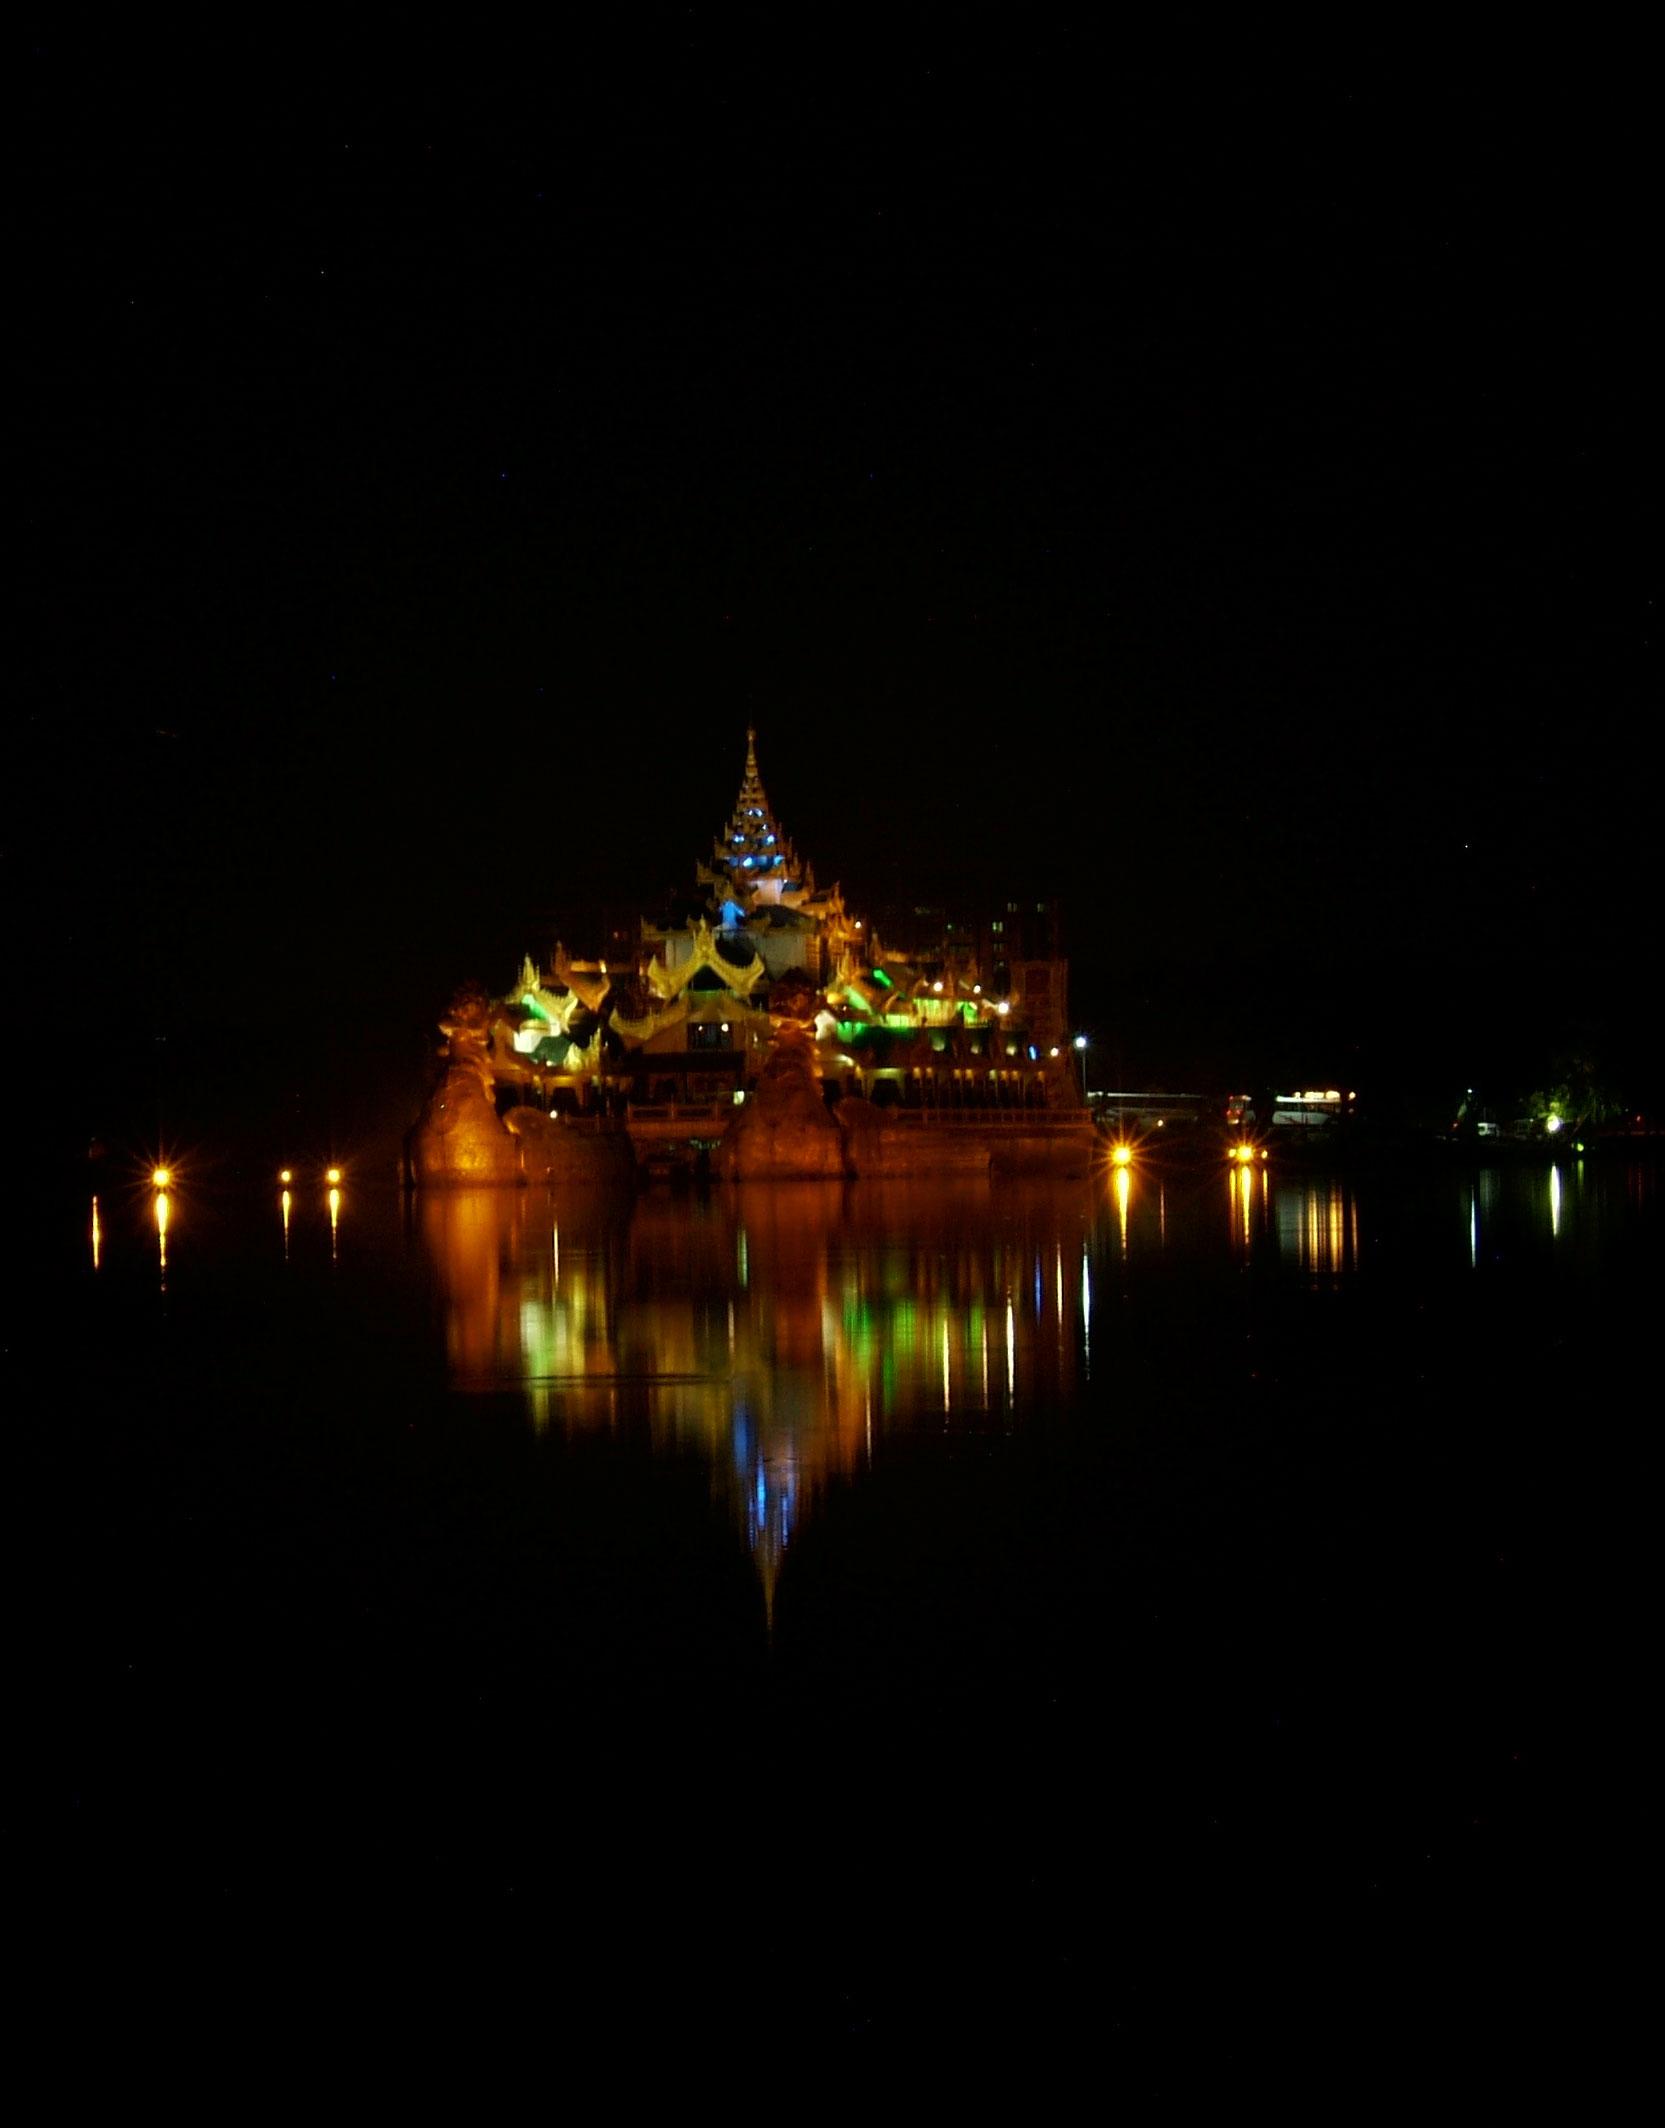 Myanmar Yangon Kandawgyi Palace Hotel royal barge Nov 2004 11